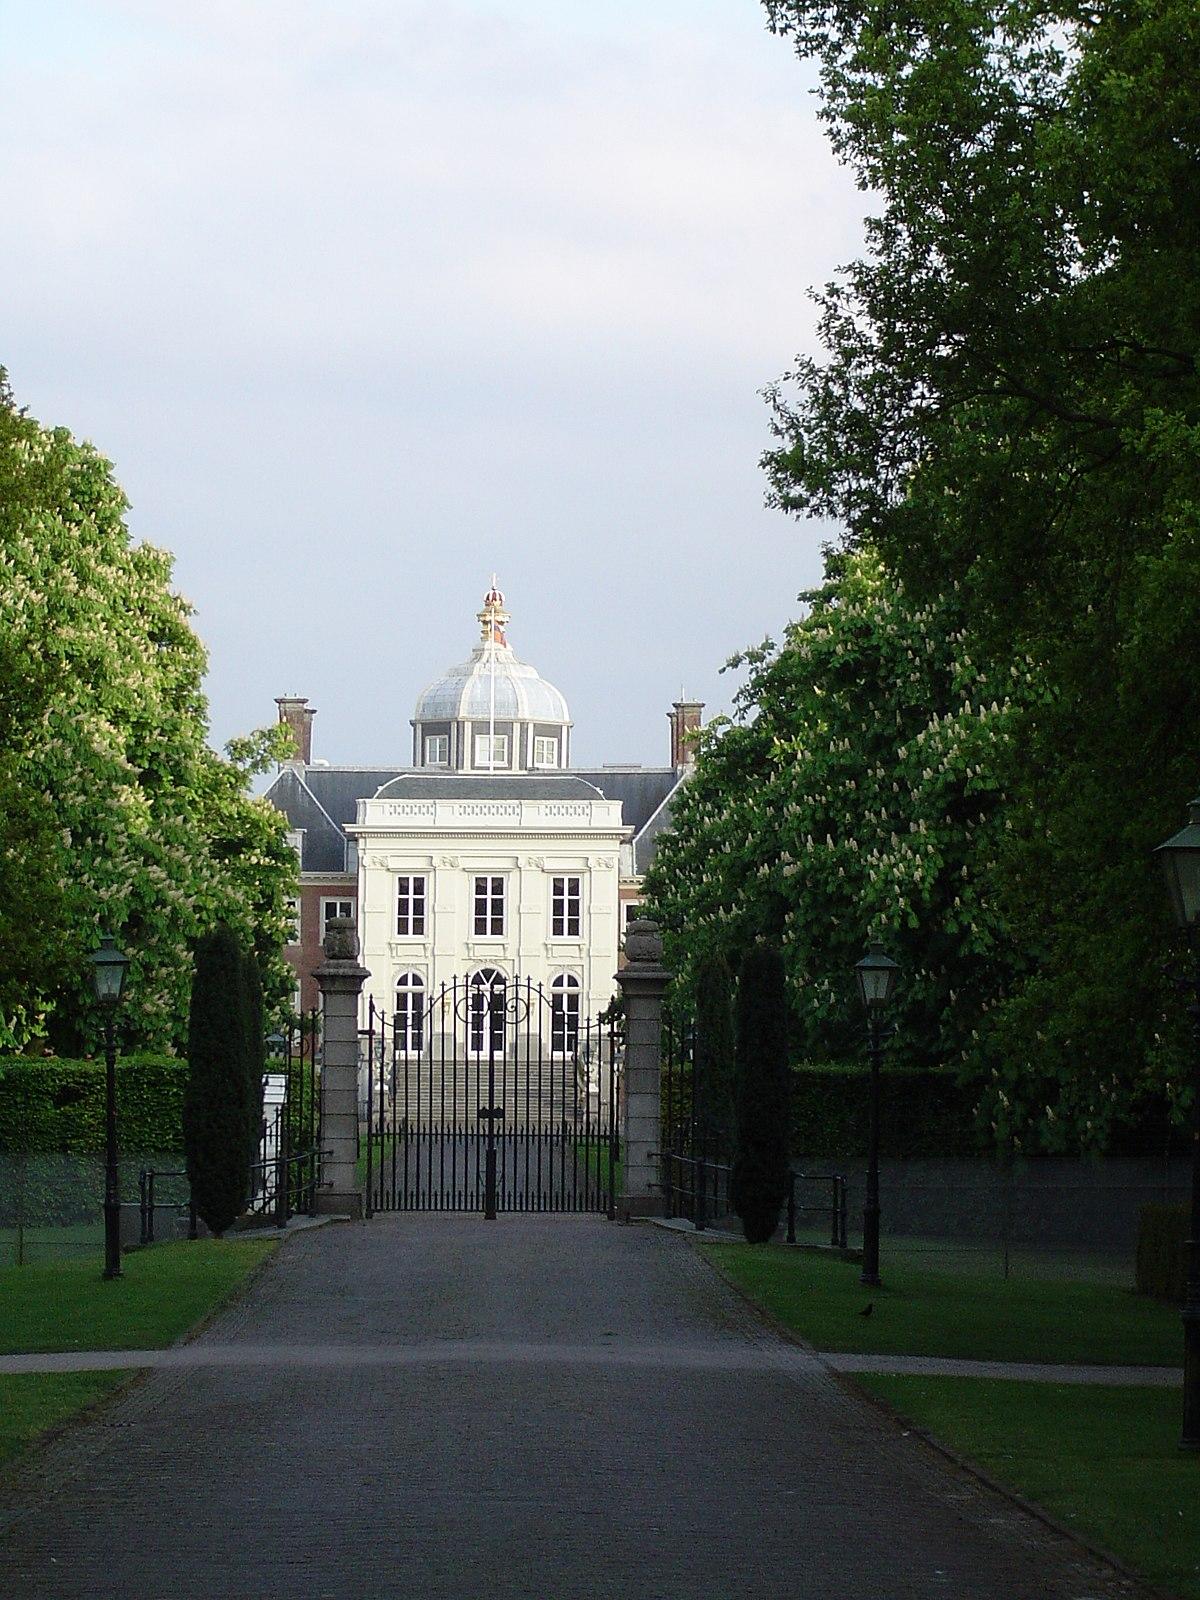 Huis ten Bosch  Wikipedia